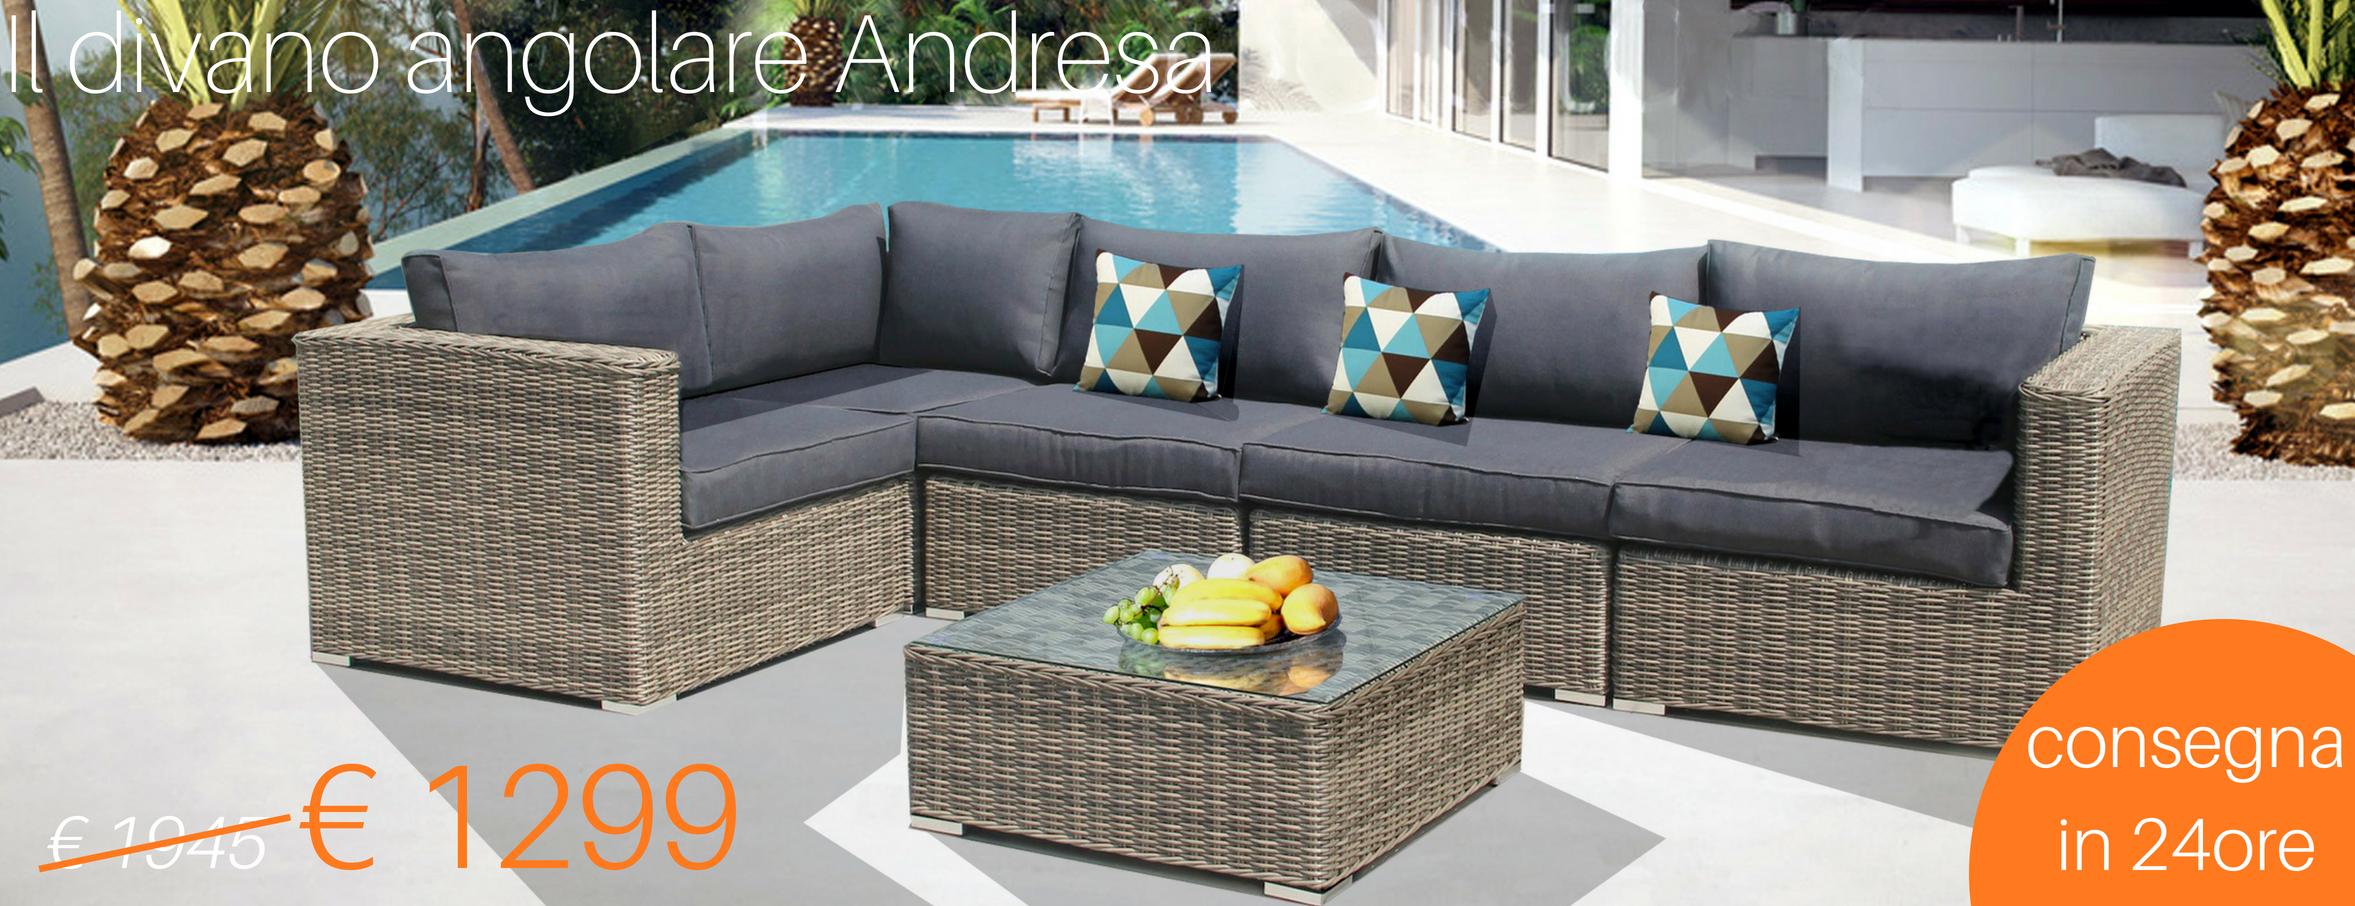 Arredo giardino on line mobili da esterno online for Arredo giardino rattan offerte